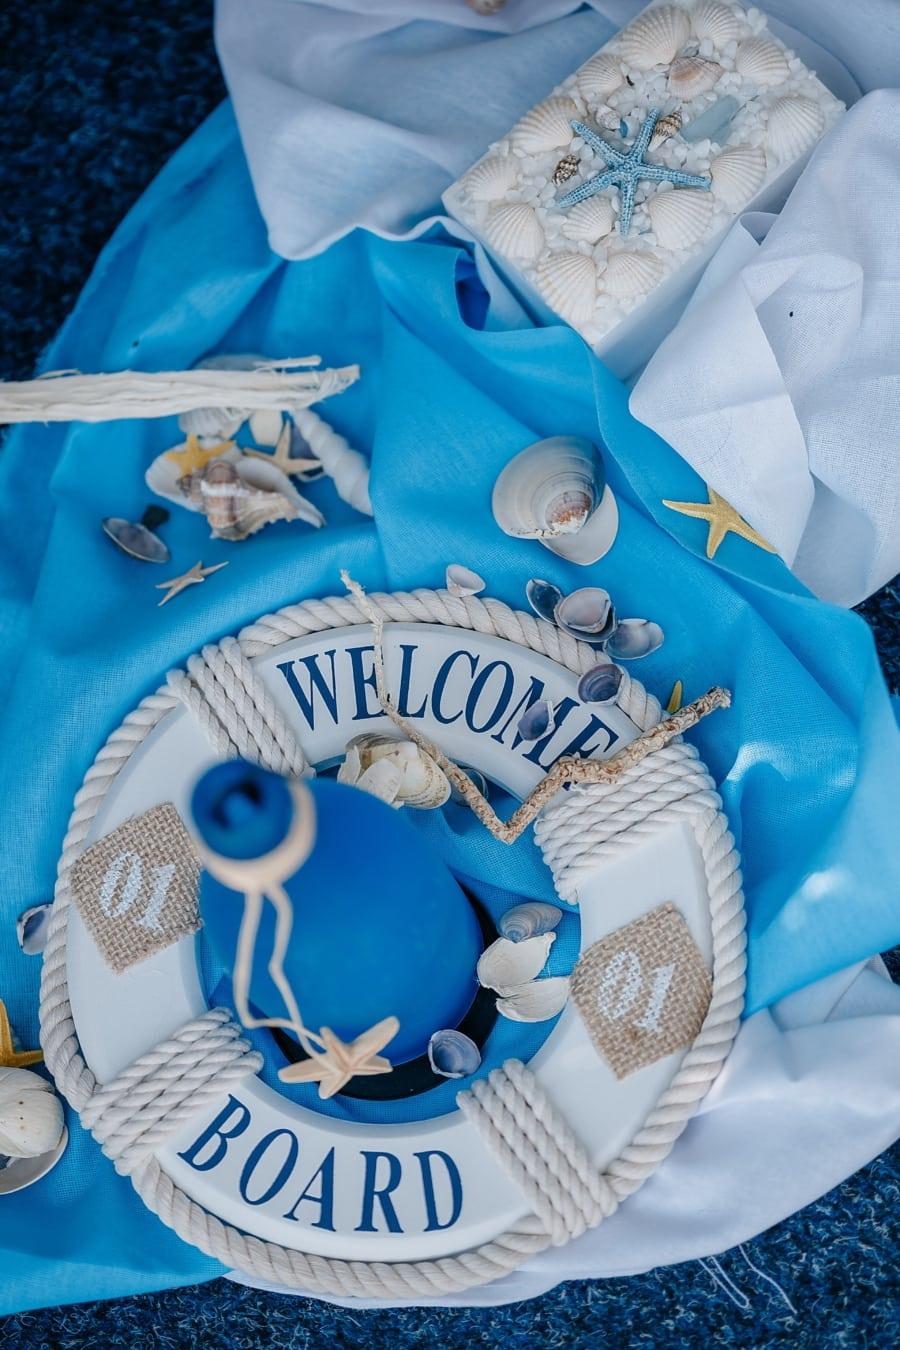 romantic, life preserver, seashell, decorative, decoration, love, traditional, romance, interior design, thread